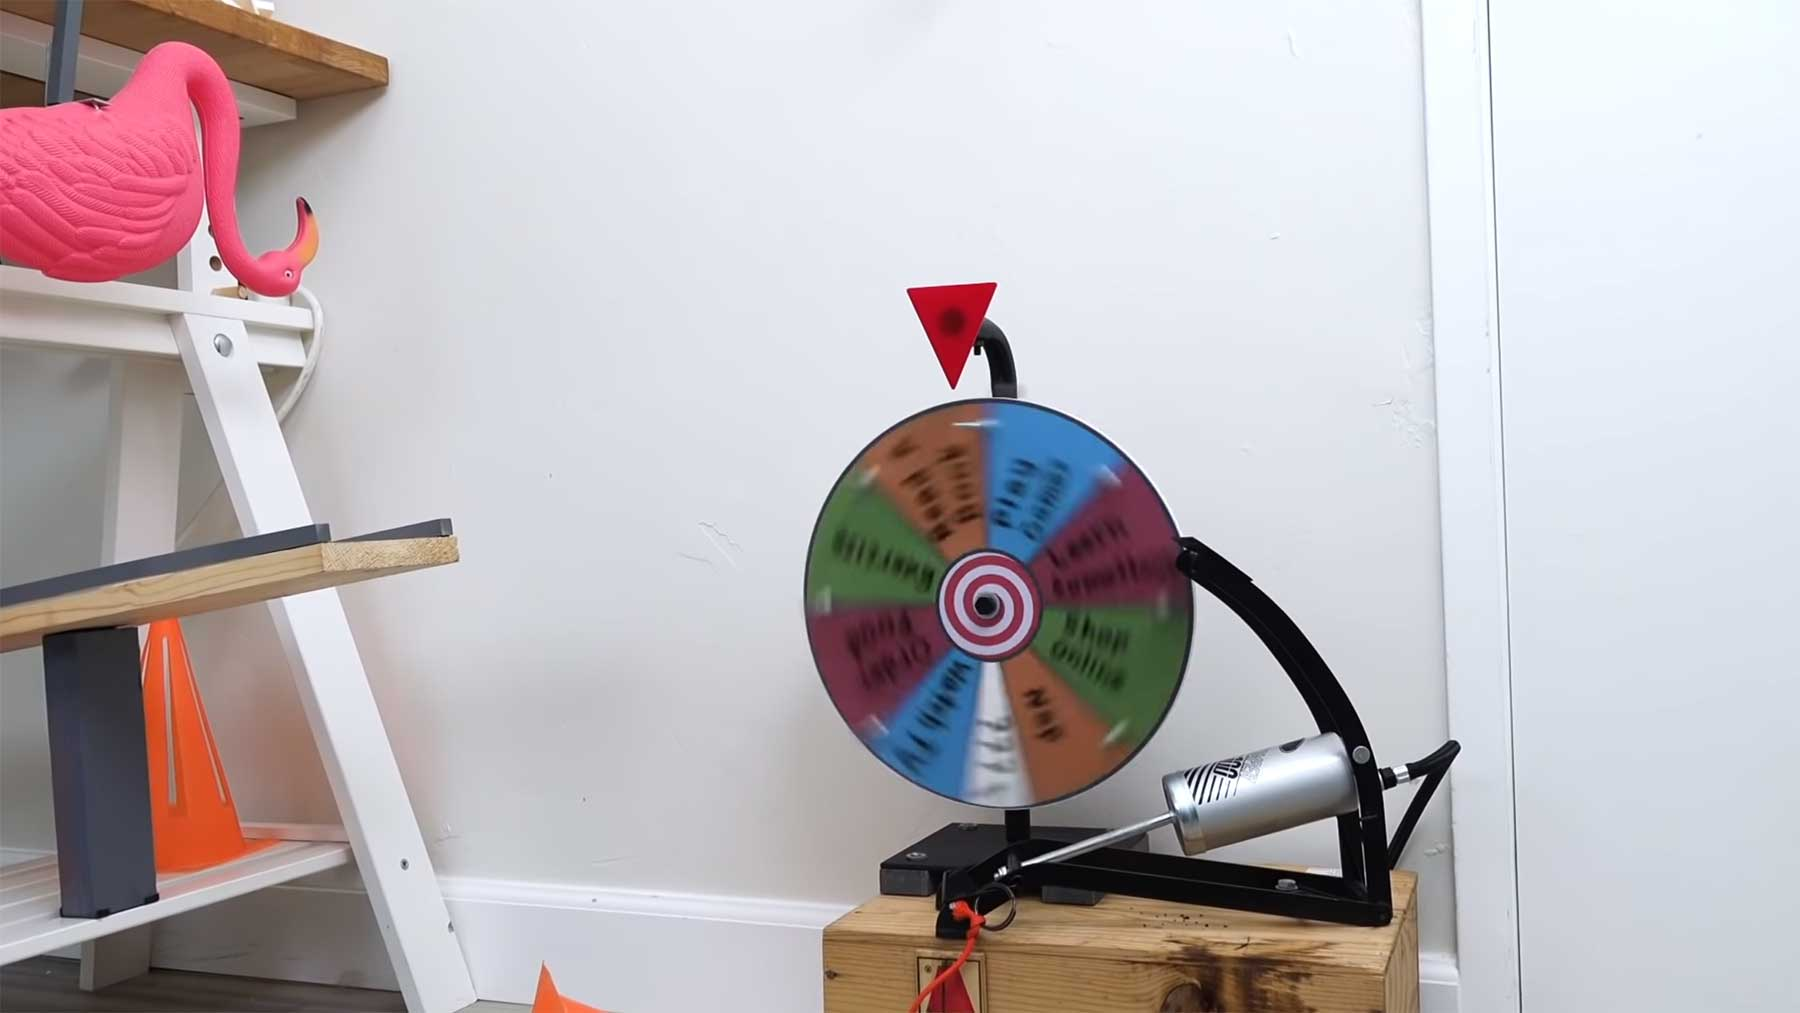 Anti-Langeweile-Kettenreaktion boredom-cure-machine